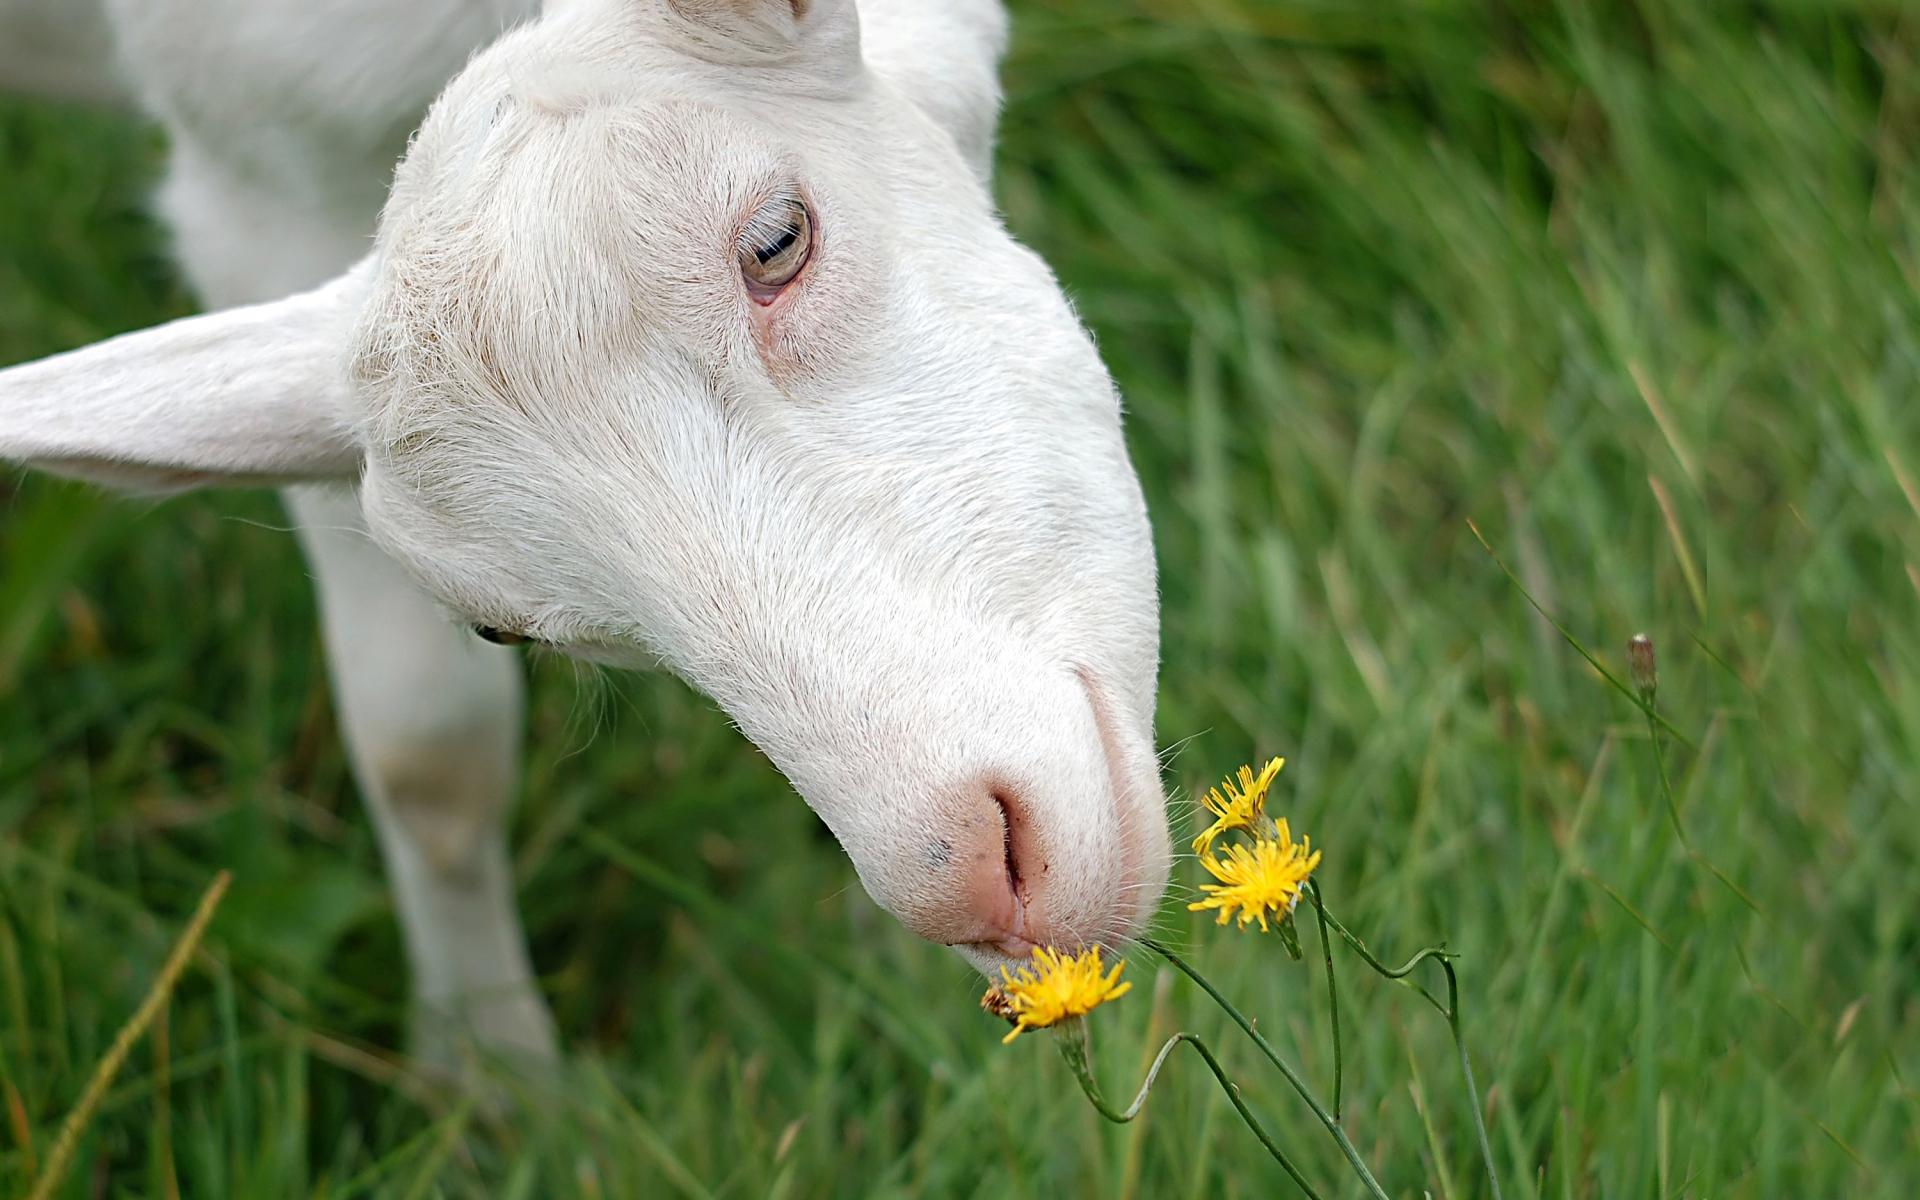 фото коза за столом картинка намерение